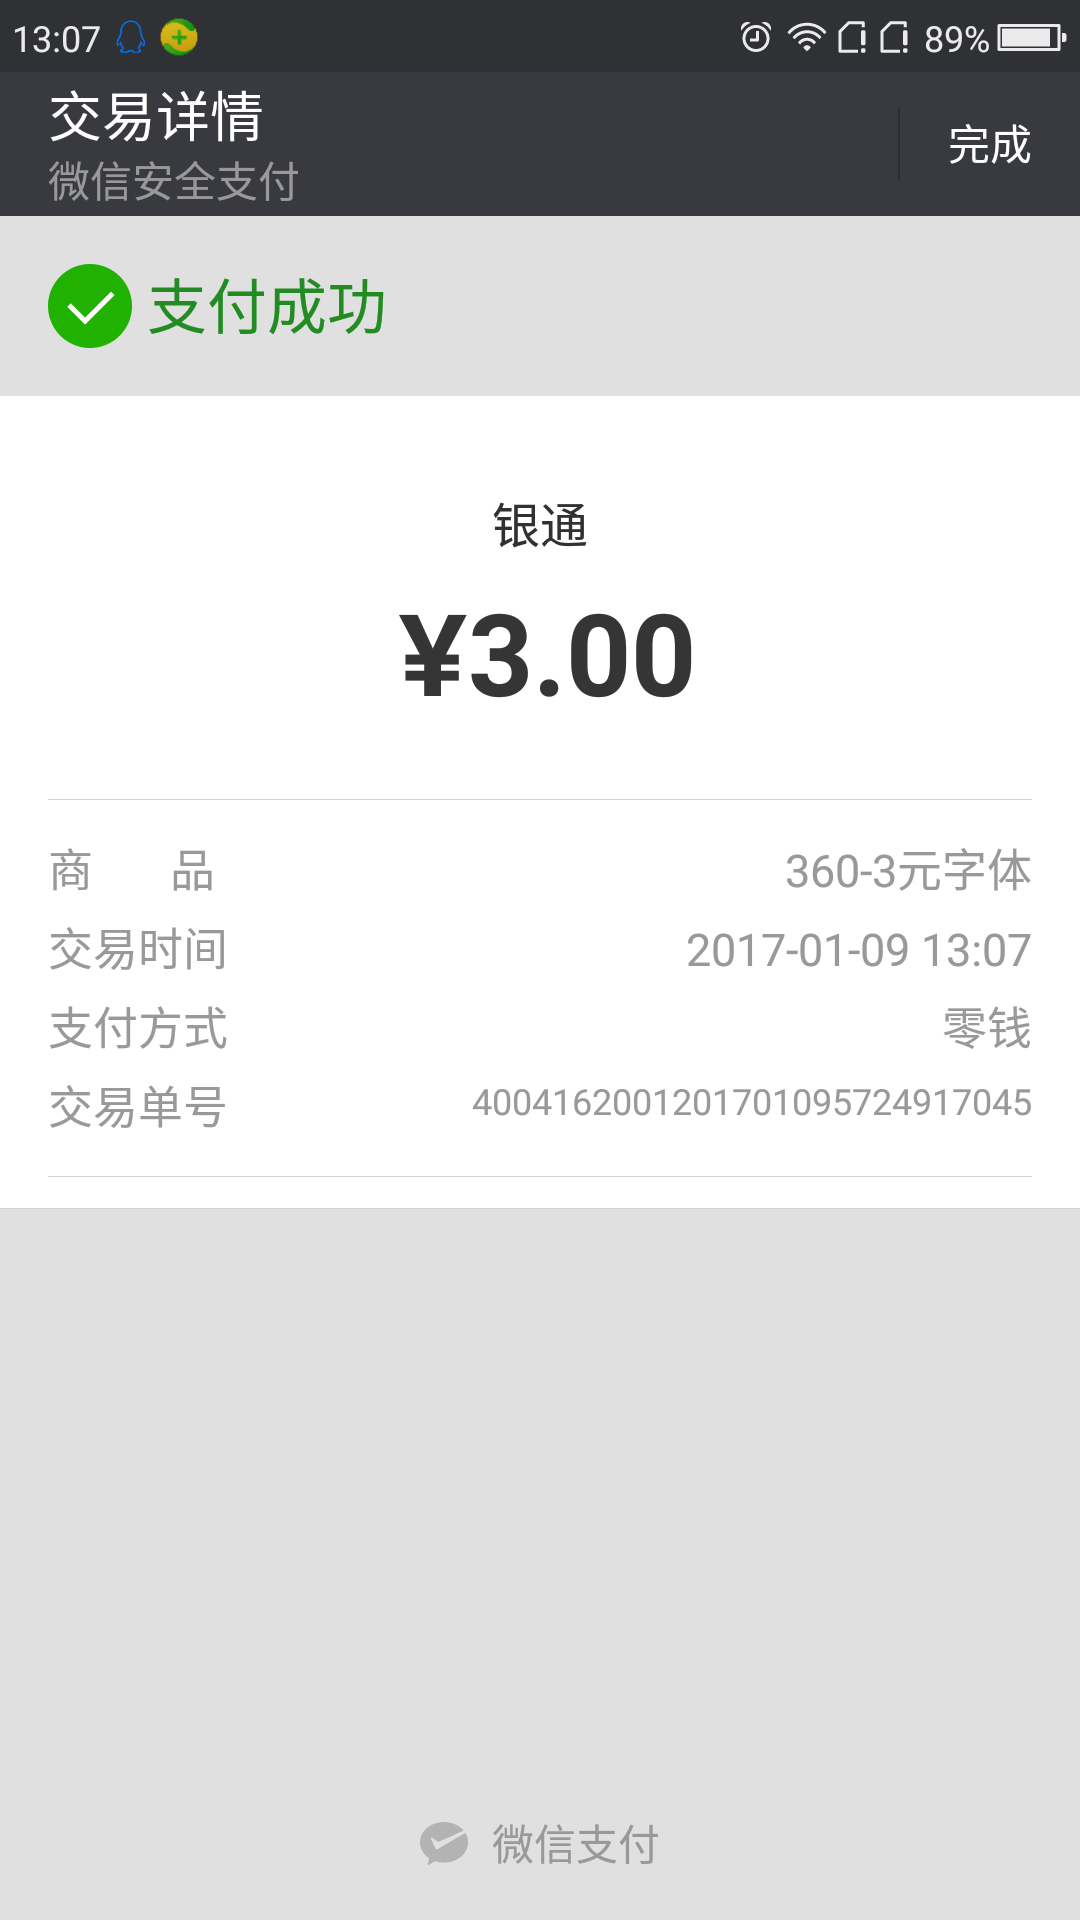 Screenshot_2017-01-09-13-07-48.png